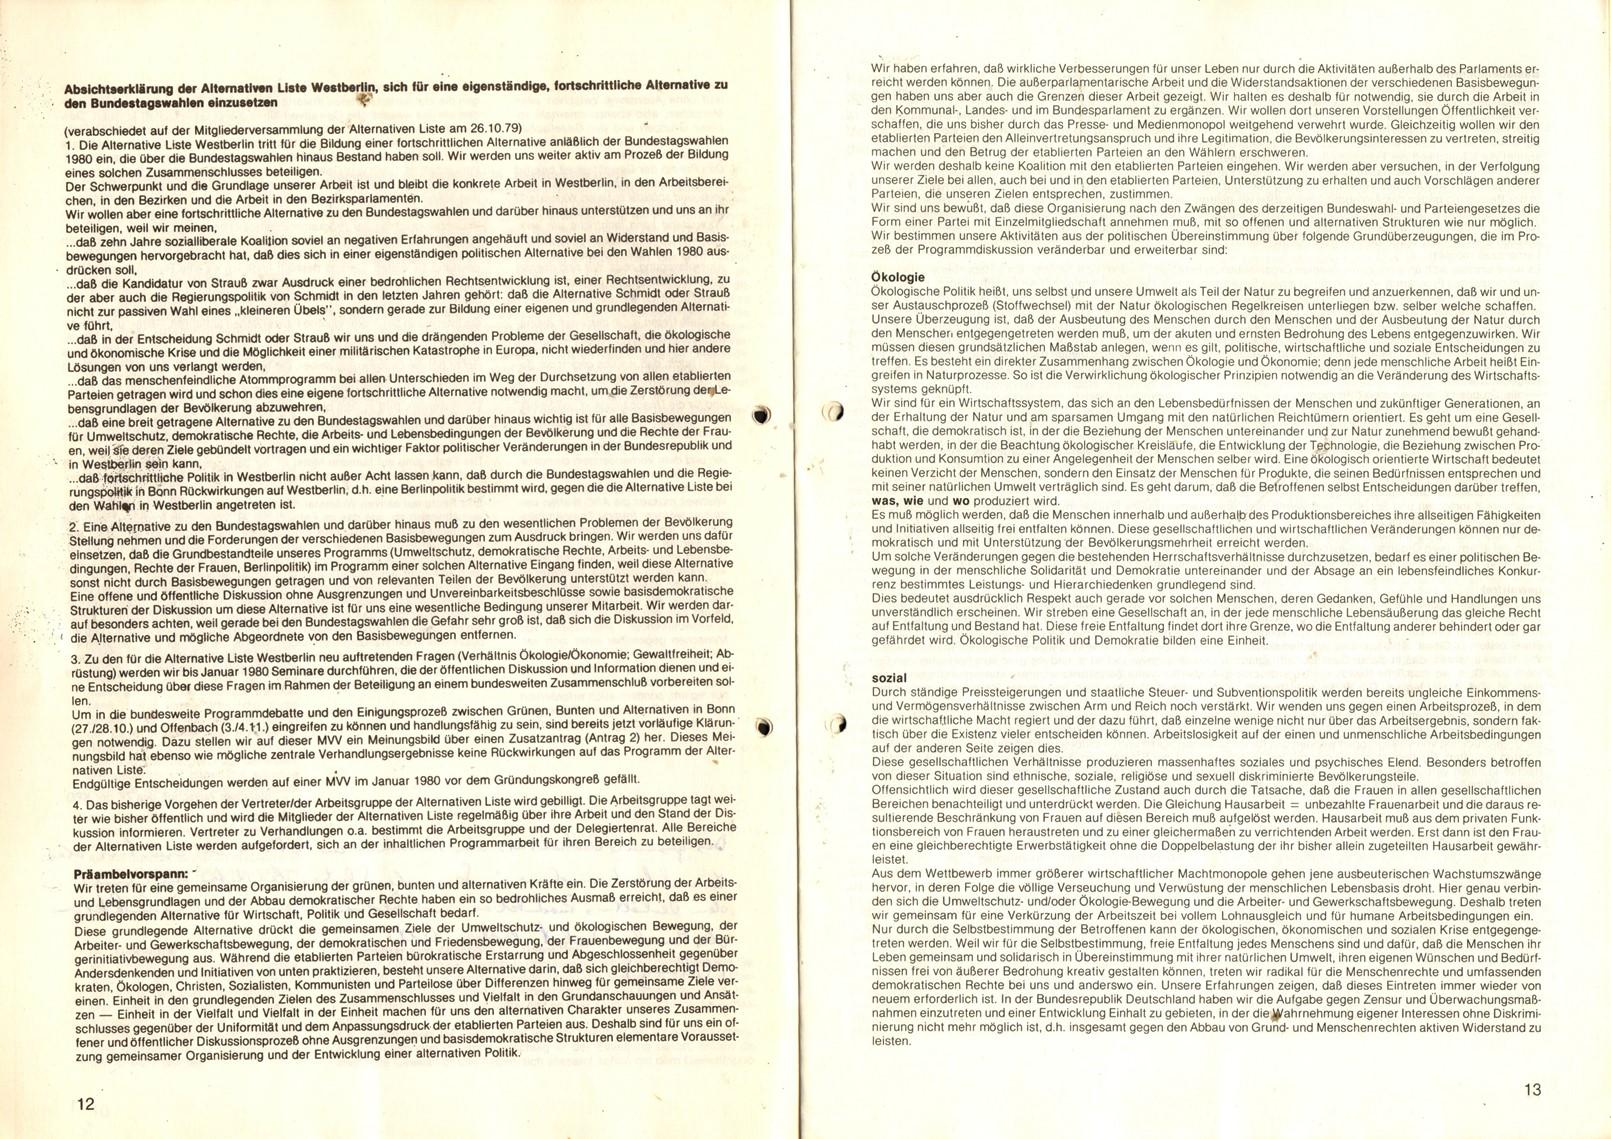 KPDAO_1979_Diskussion_Bundestagswahlen_1980_07